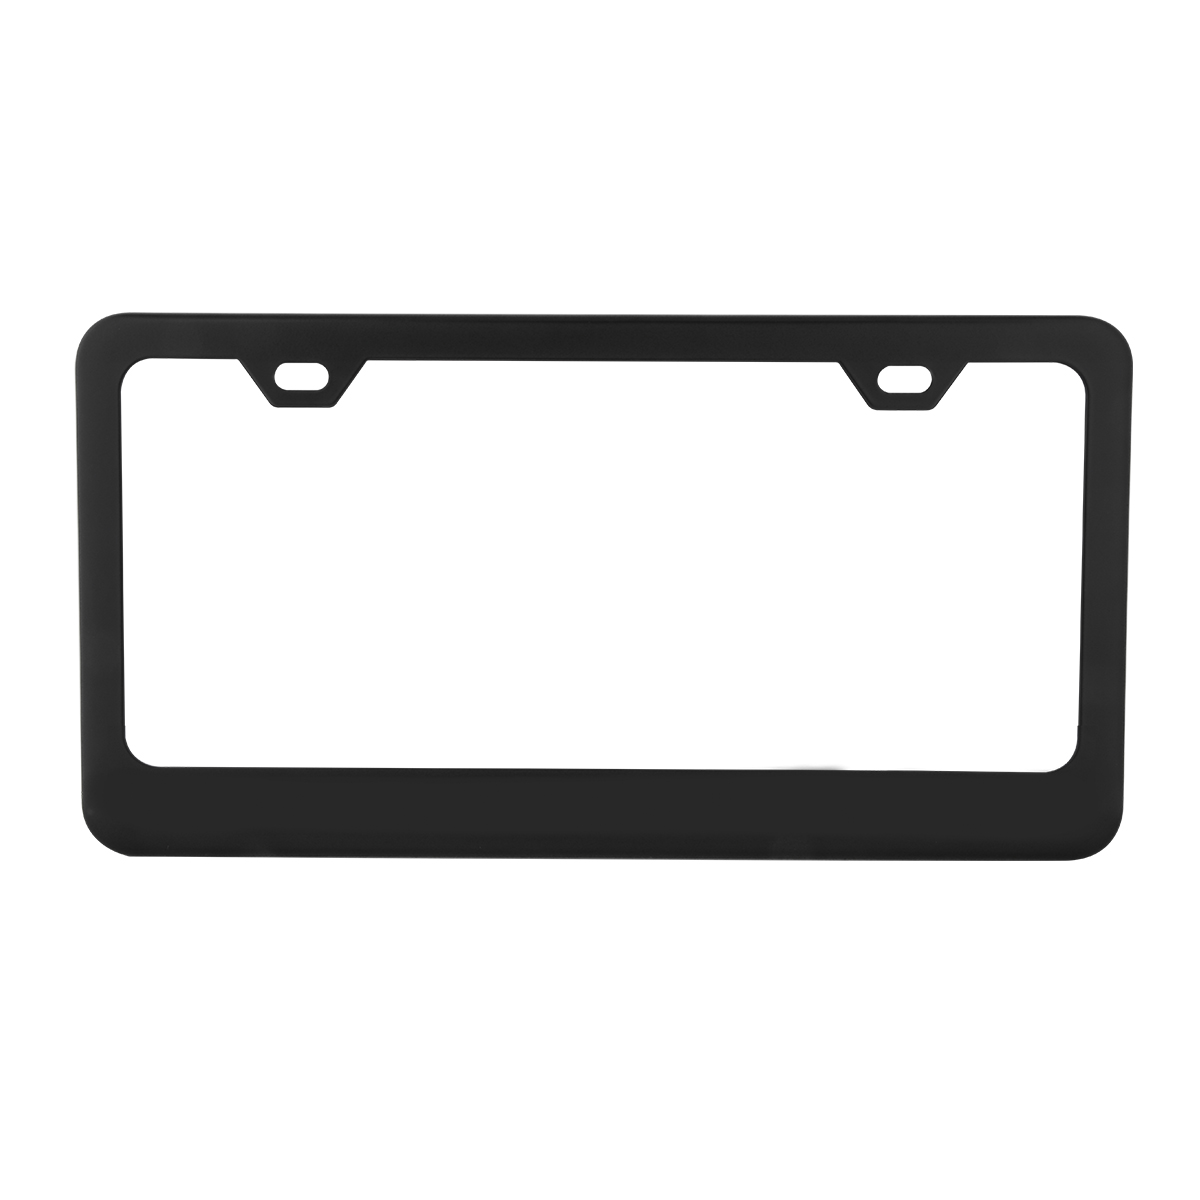 60439 Flat/Matte Plain Black 2 Hole License Plate Frame